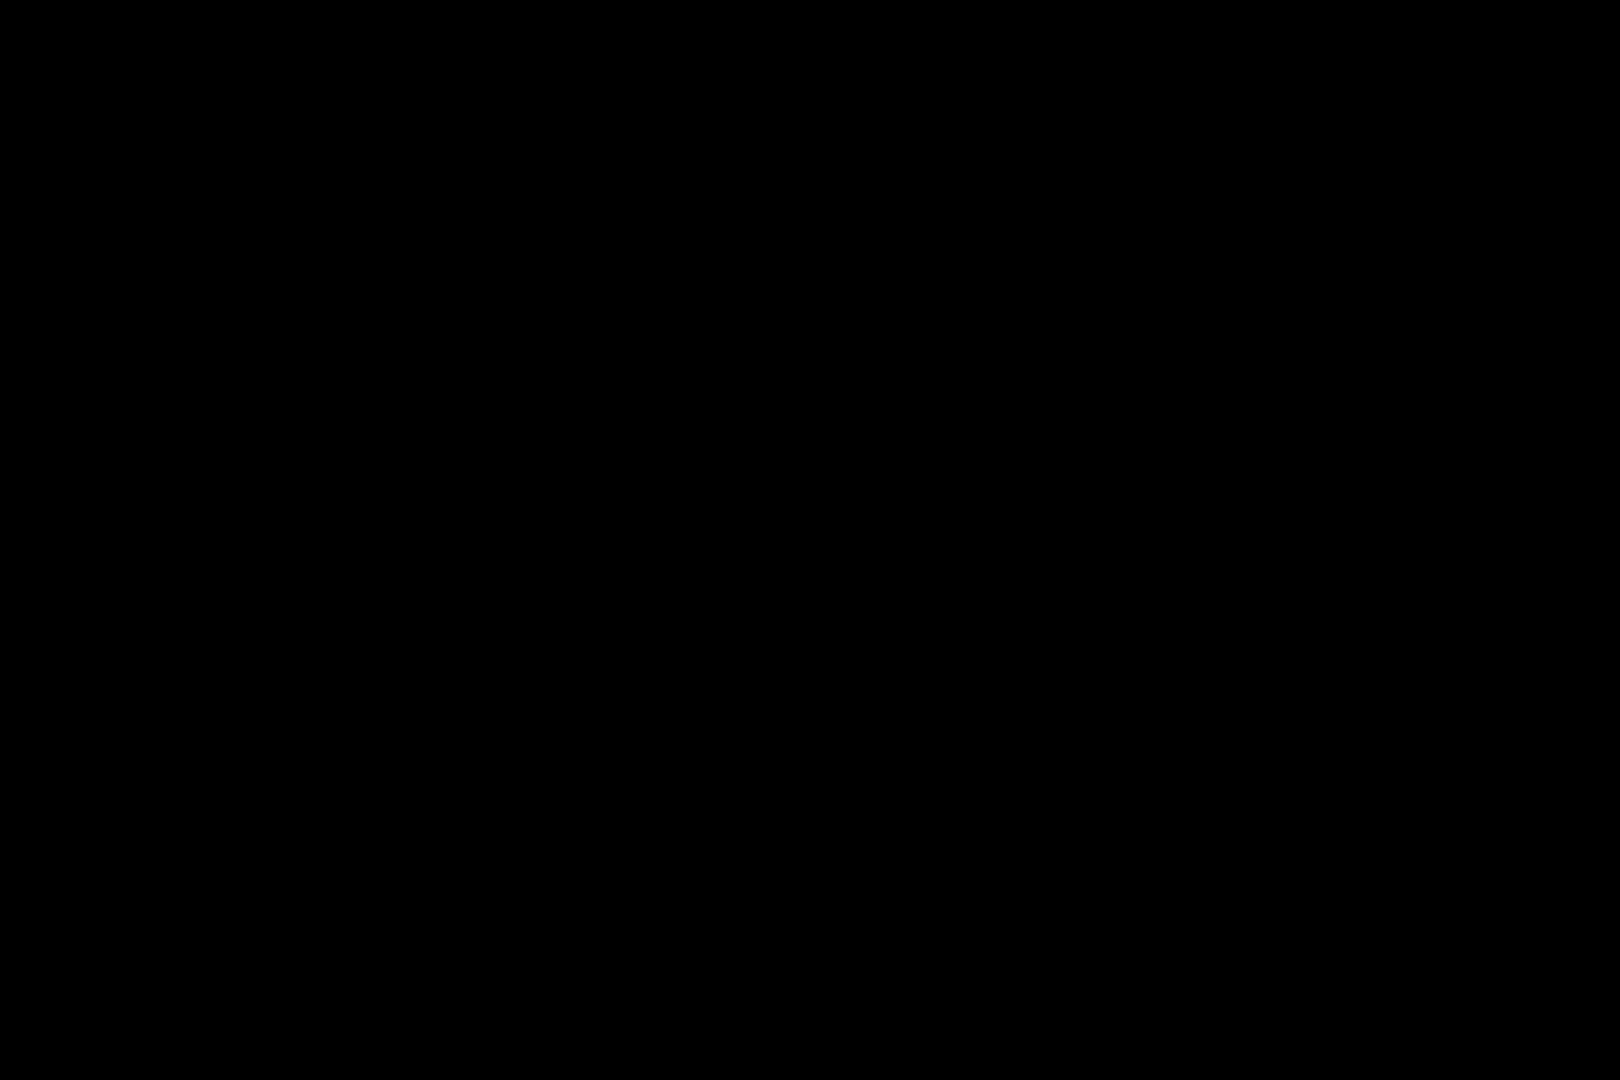 Aquaな露天風呂Vol.480 盗撮シリーズ | 露天風呂編  102PIX 15